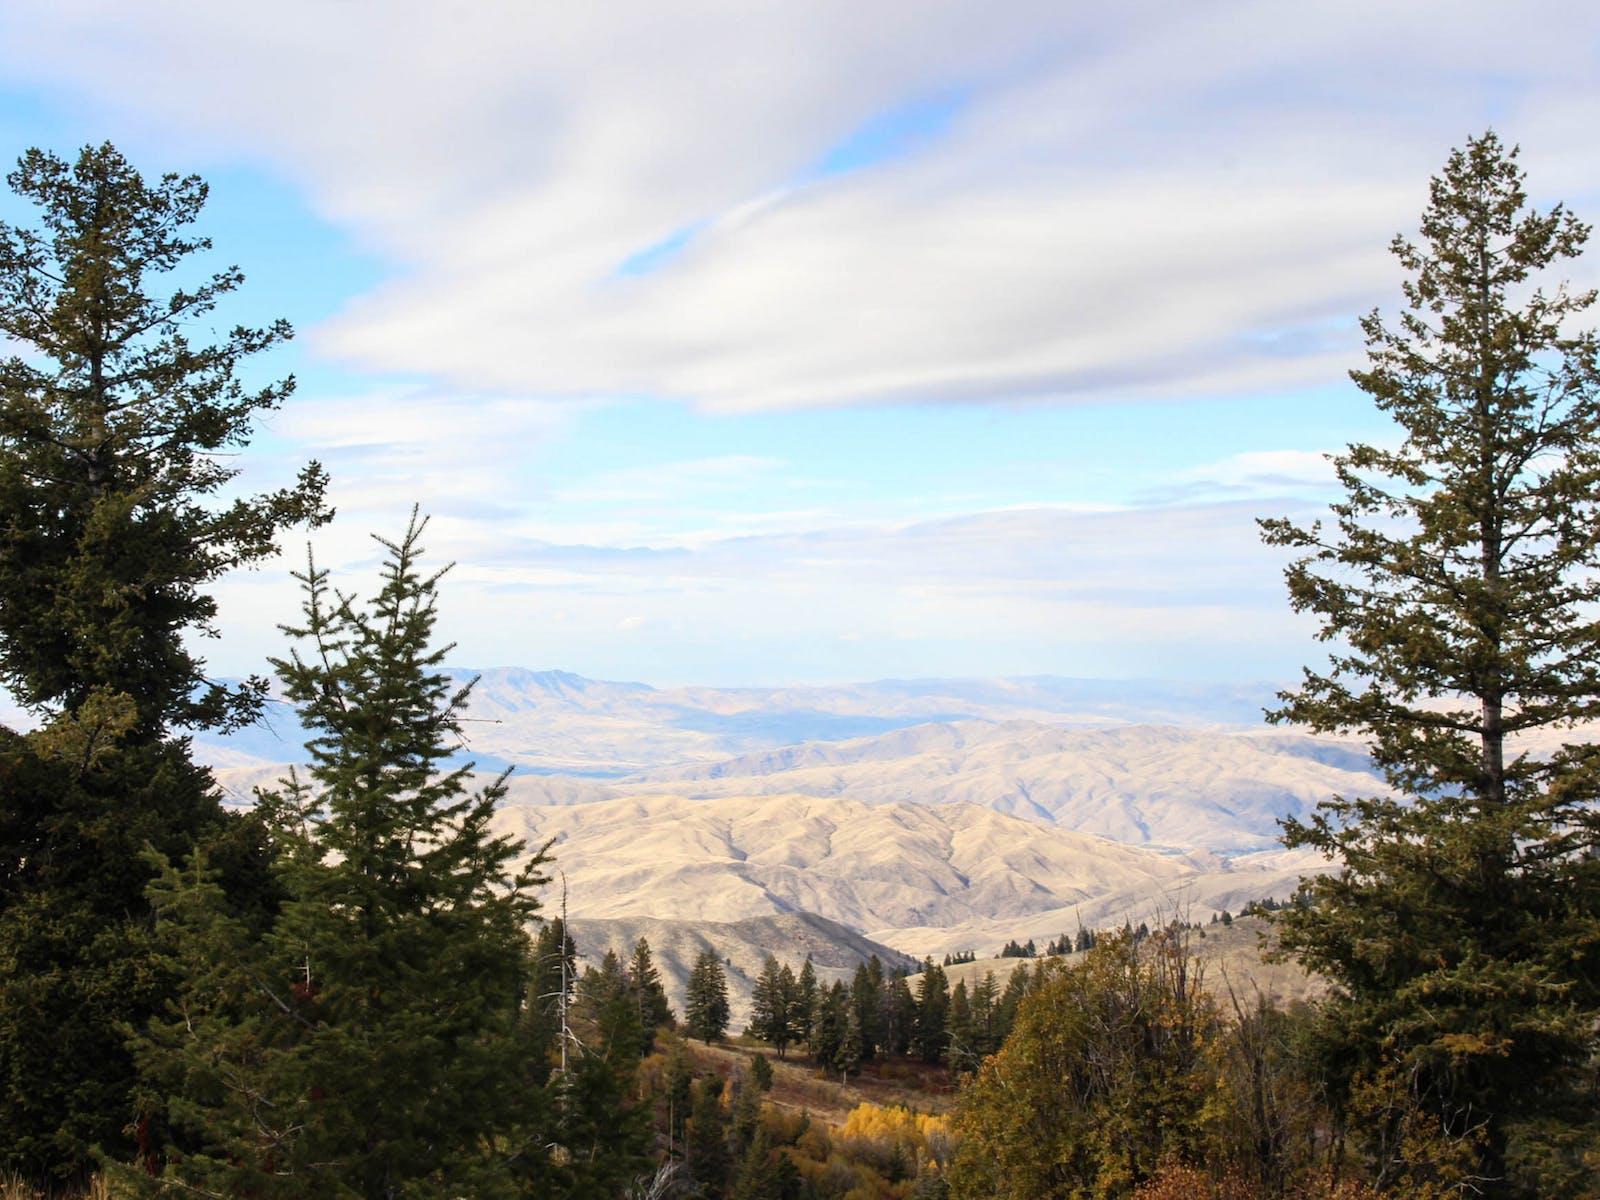 Bogus Basin in Boise, Idaho